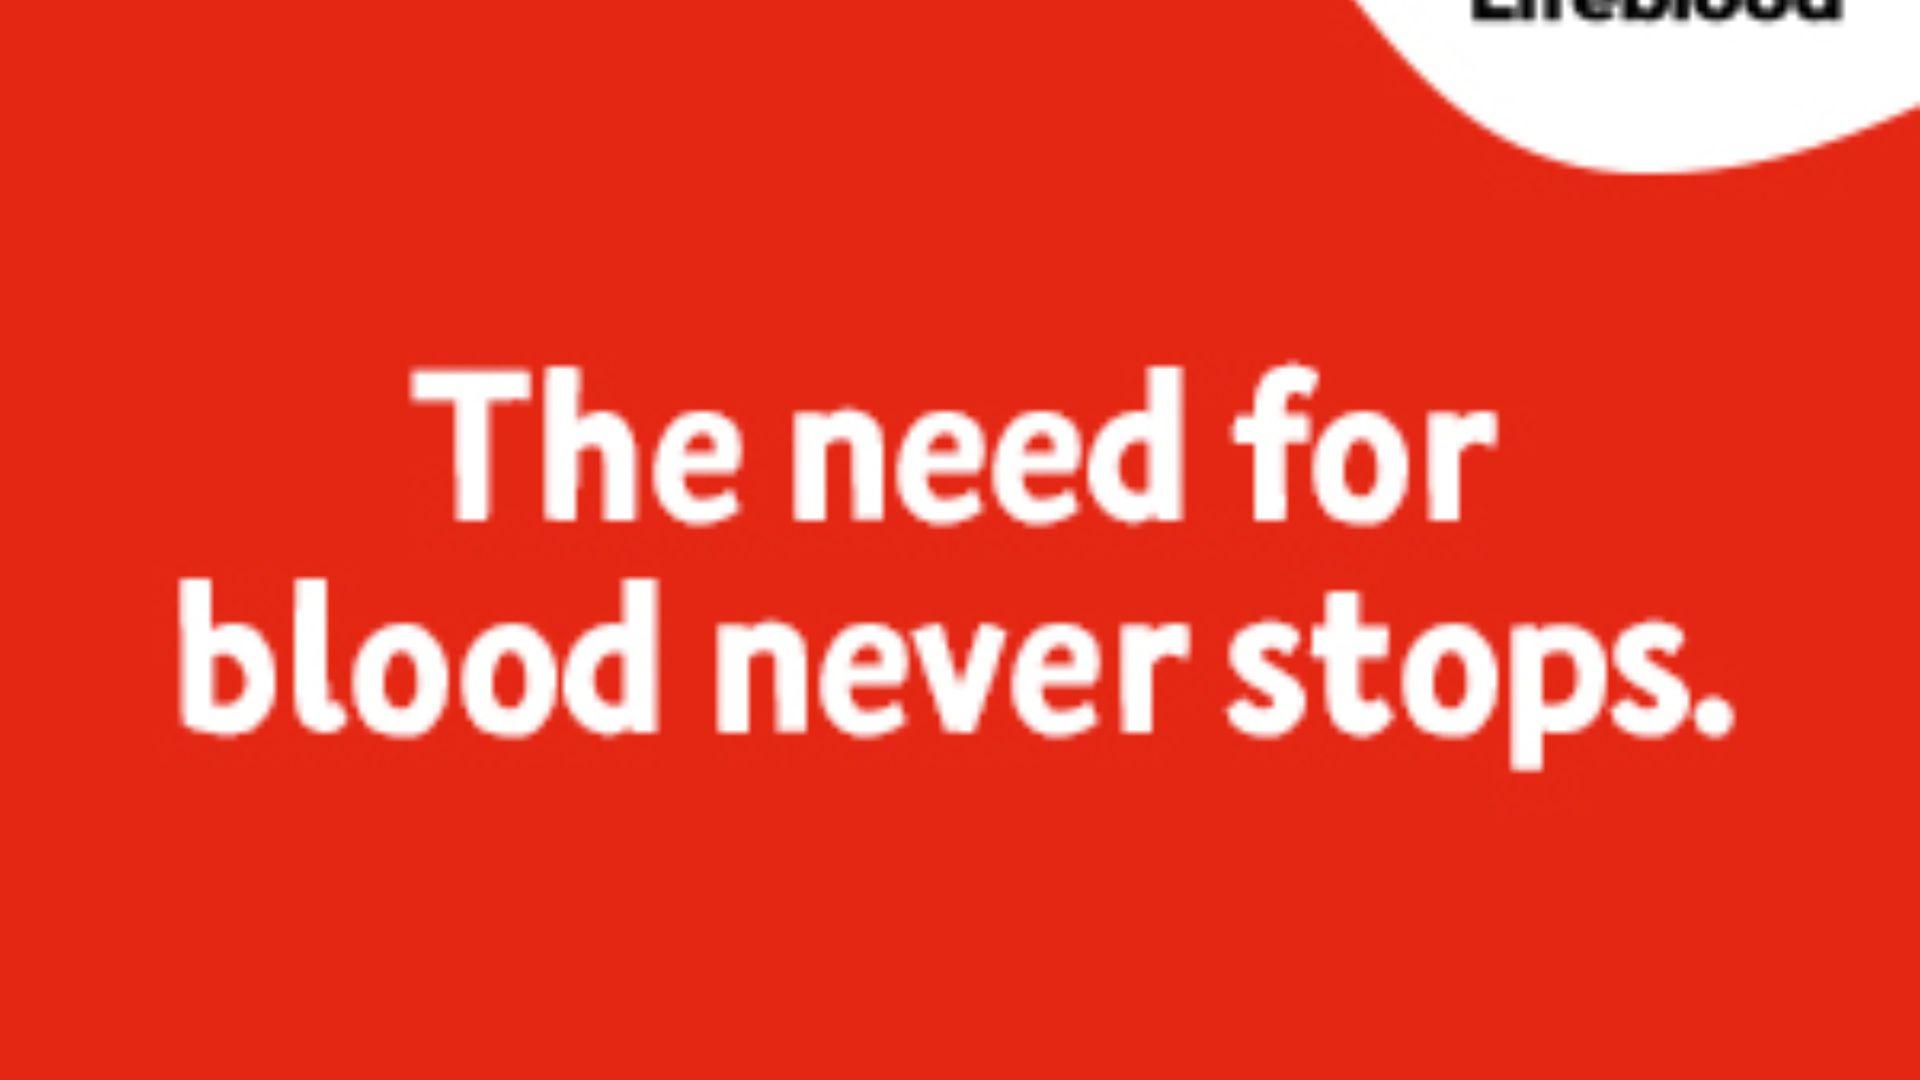 Charles Sturt meets challenge of blood donation despite COVID-19